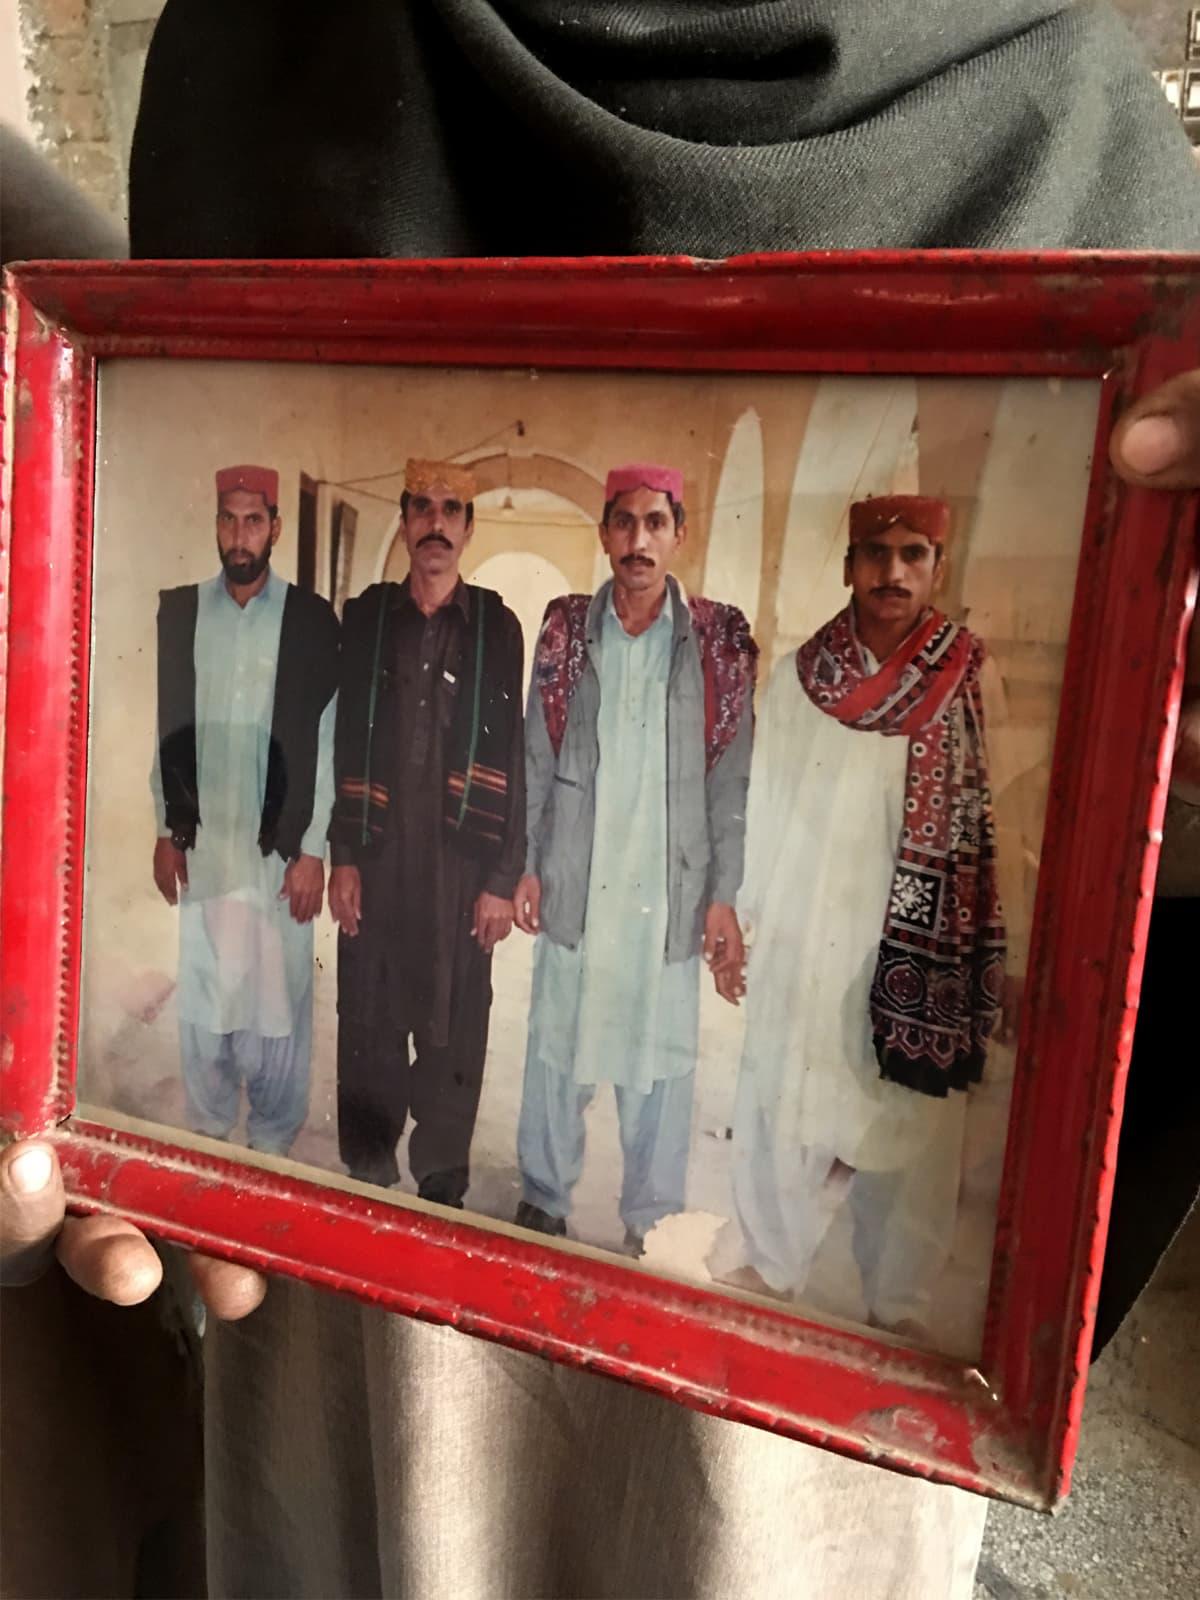 Left to right: Ghulam Farid, Ghulam Qadir, Ghulam Sarwar and Ghulam Ghaus | Subuk Hasnain